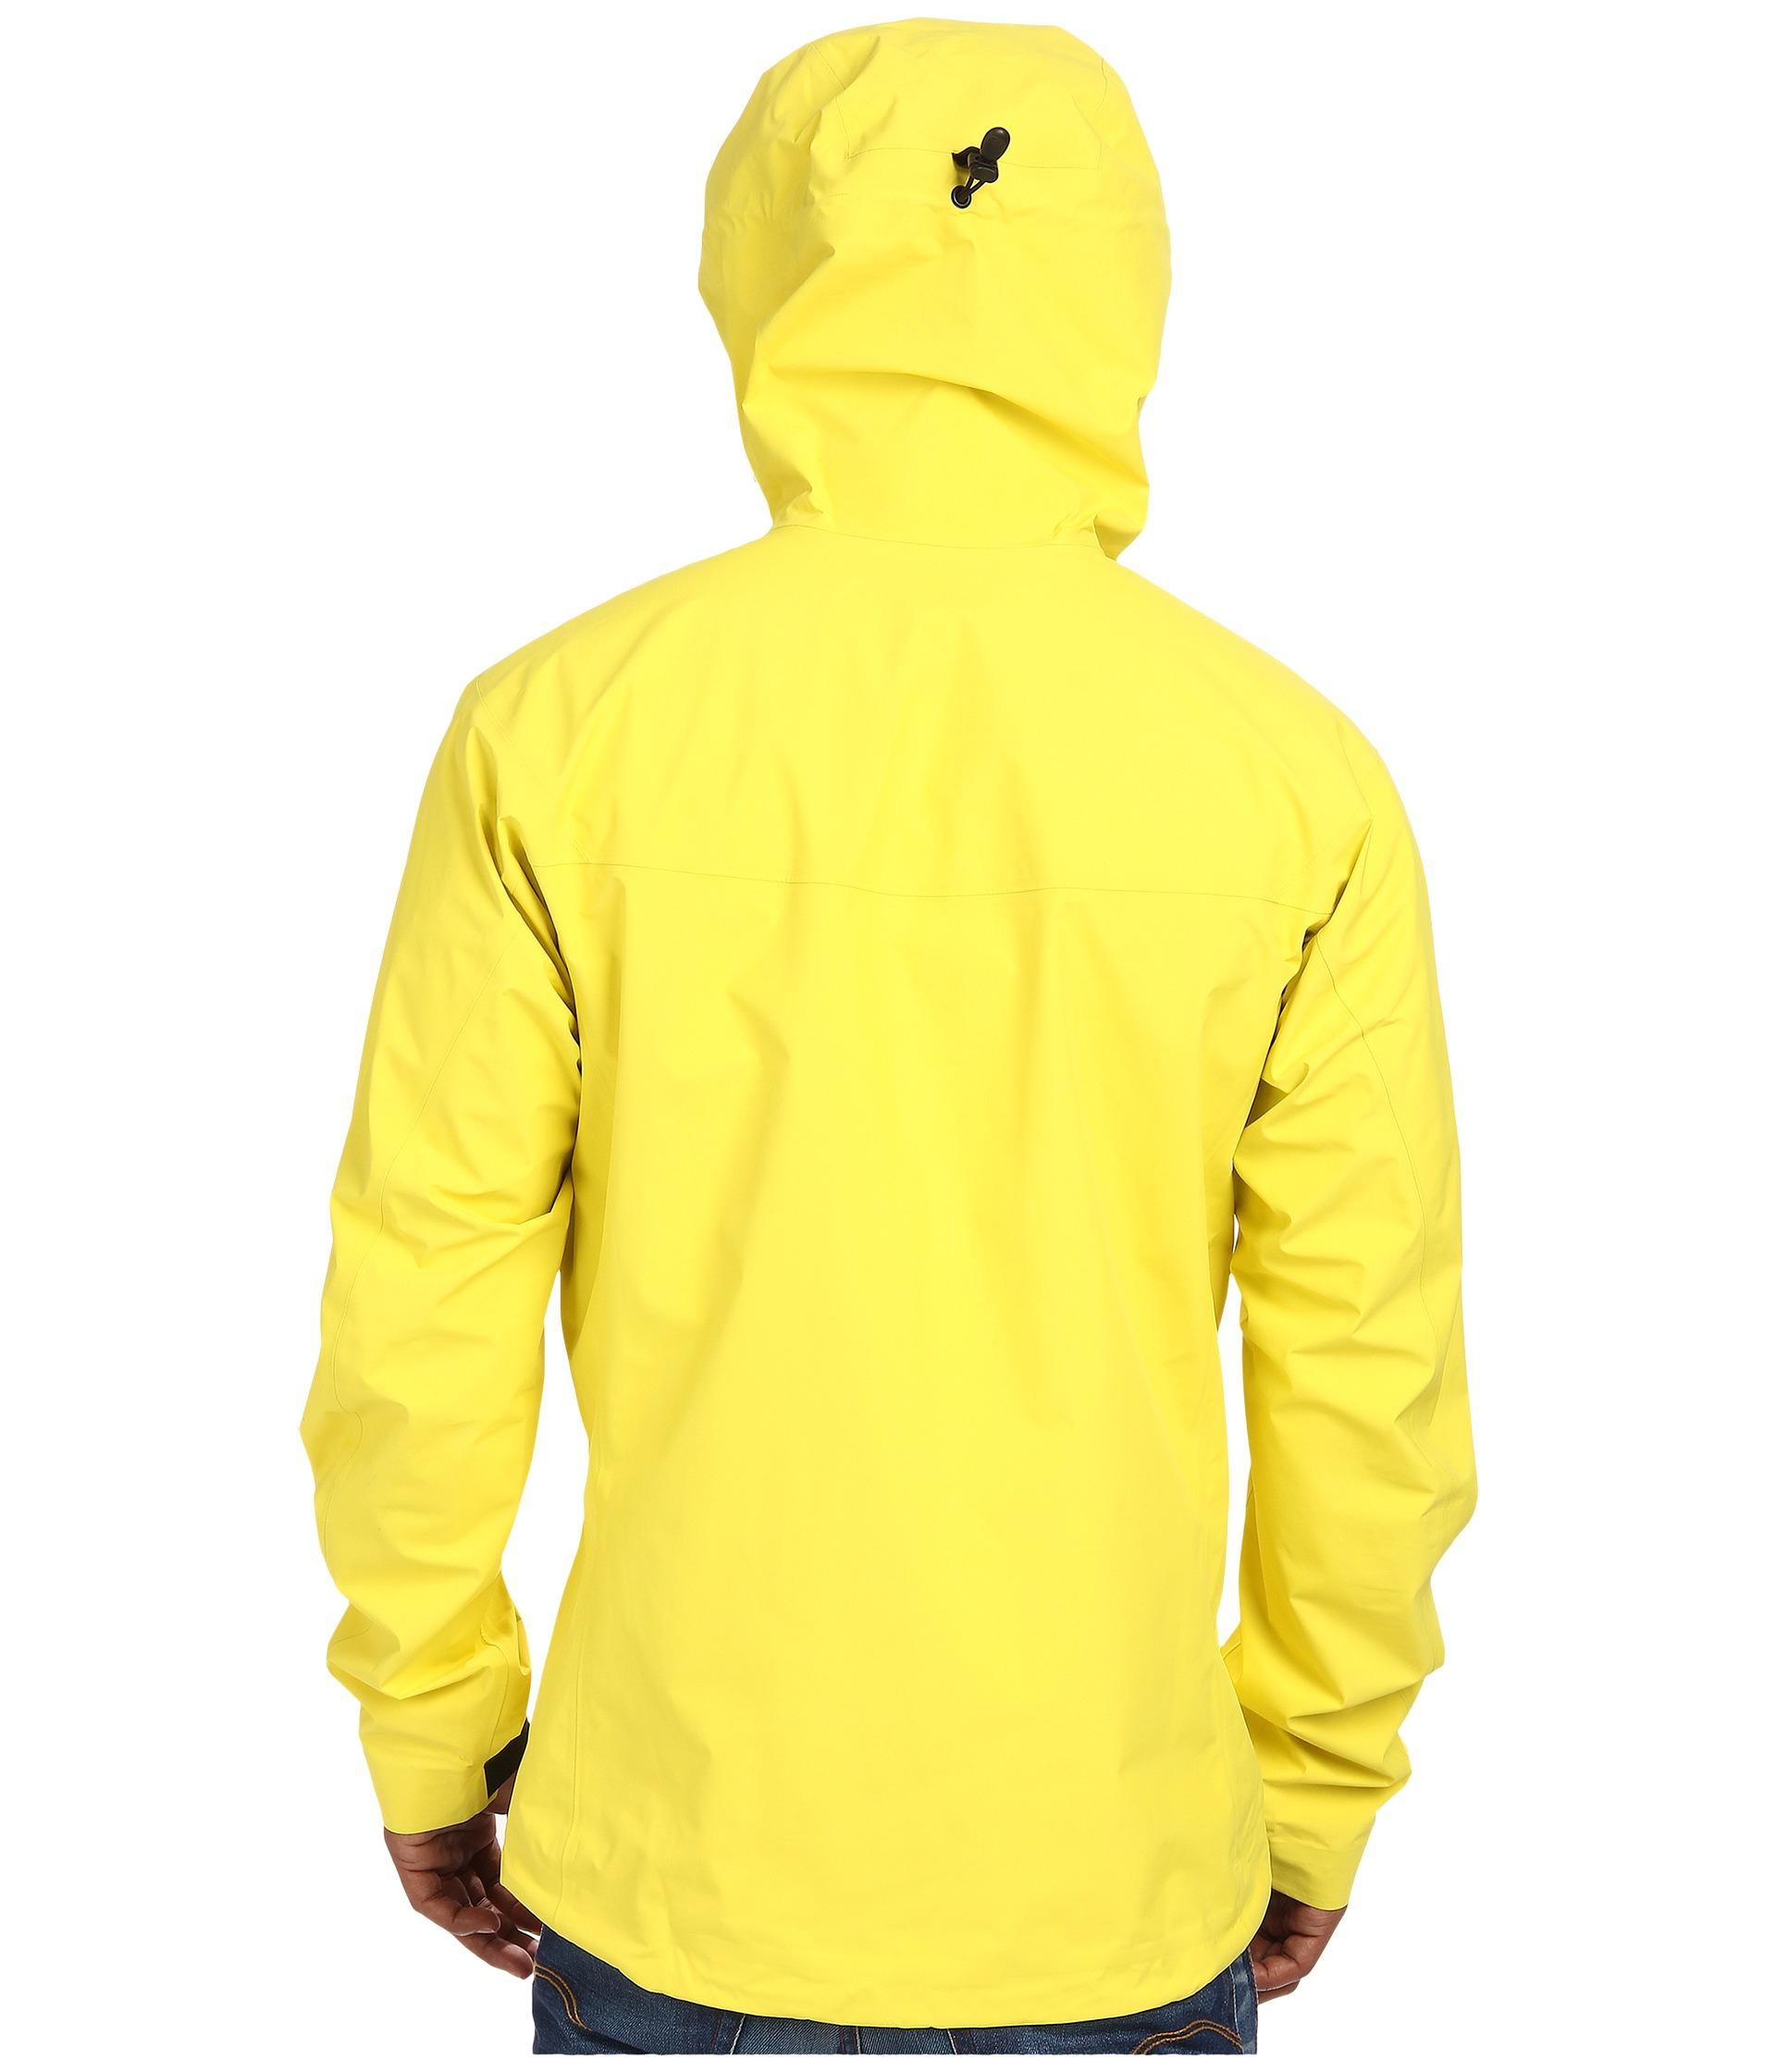 74391e0e5 Women's Yellow Alpha Sl Jacket